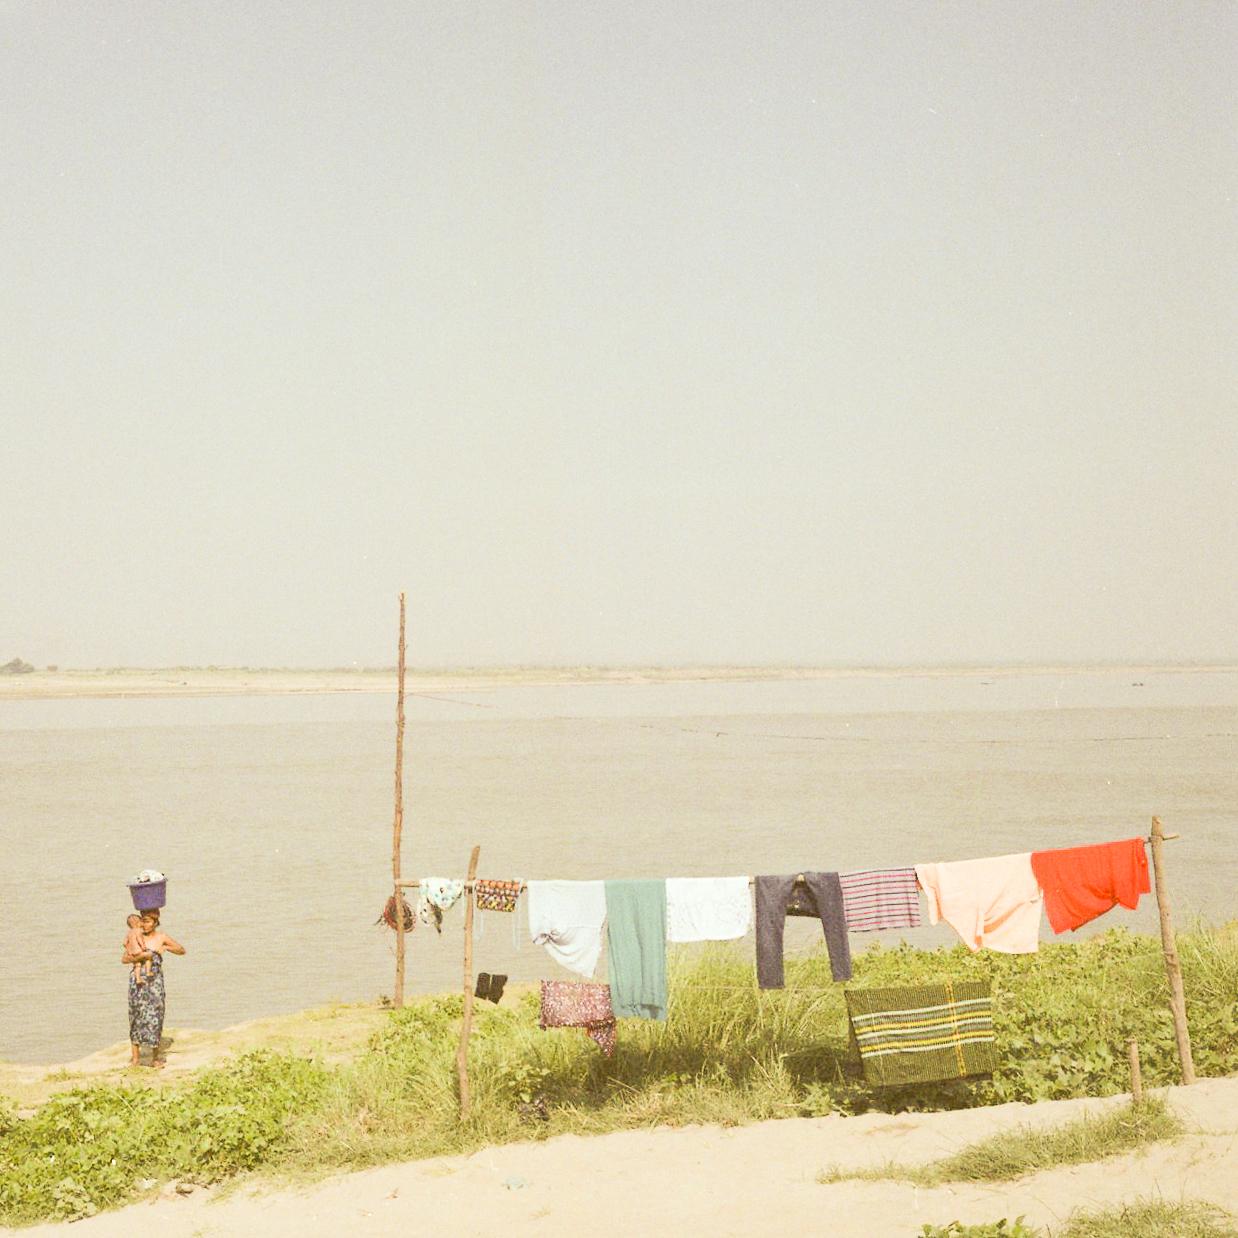 mother make laundry in Bagan, fine art photography , travel photography, shooting film, medium format, Myanmar, Burma,raffaele ferrari, rolleiflex, fujifilm